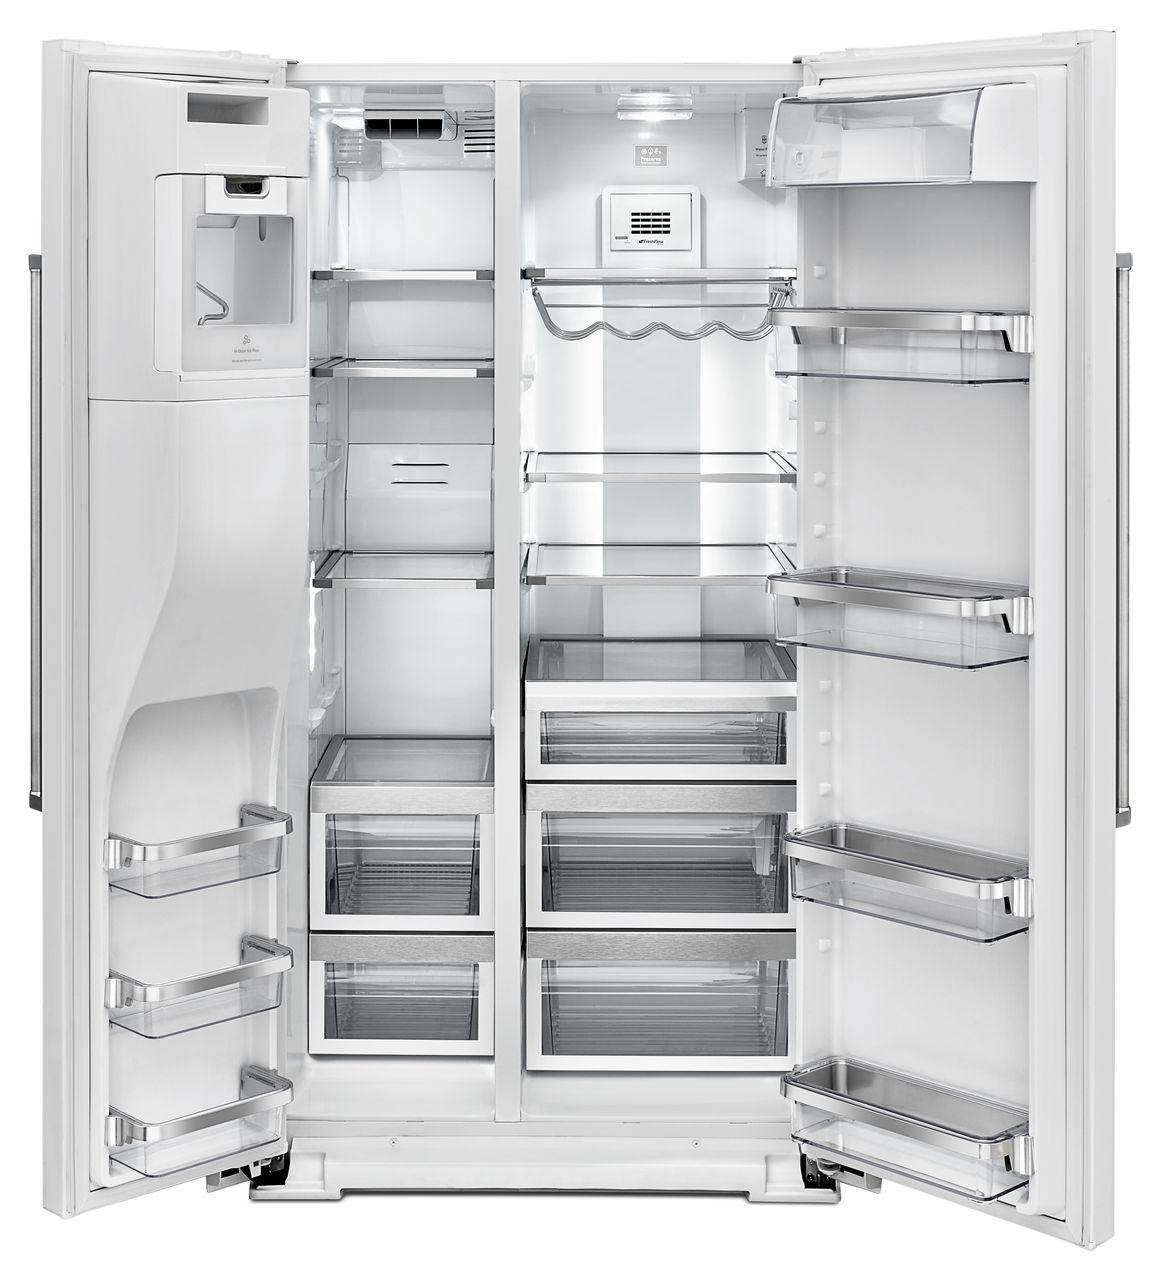 Kitchenaid Refrigerator White kitchenaid white sideside refrigerator - krsf505ewh